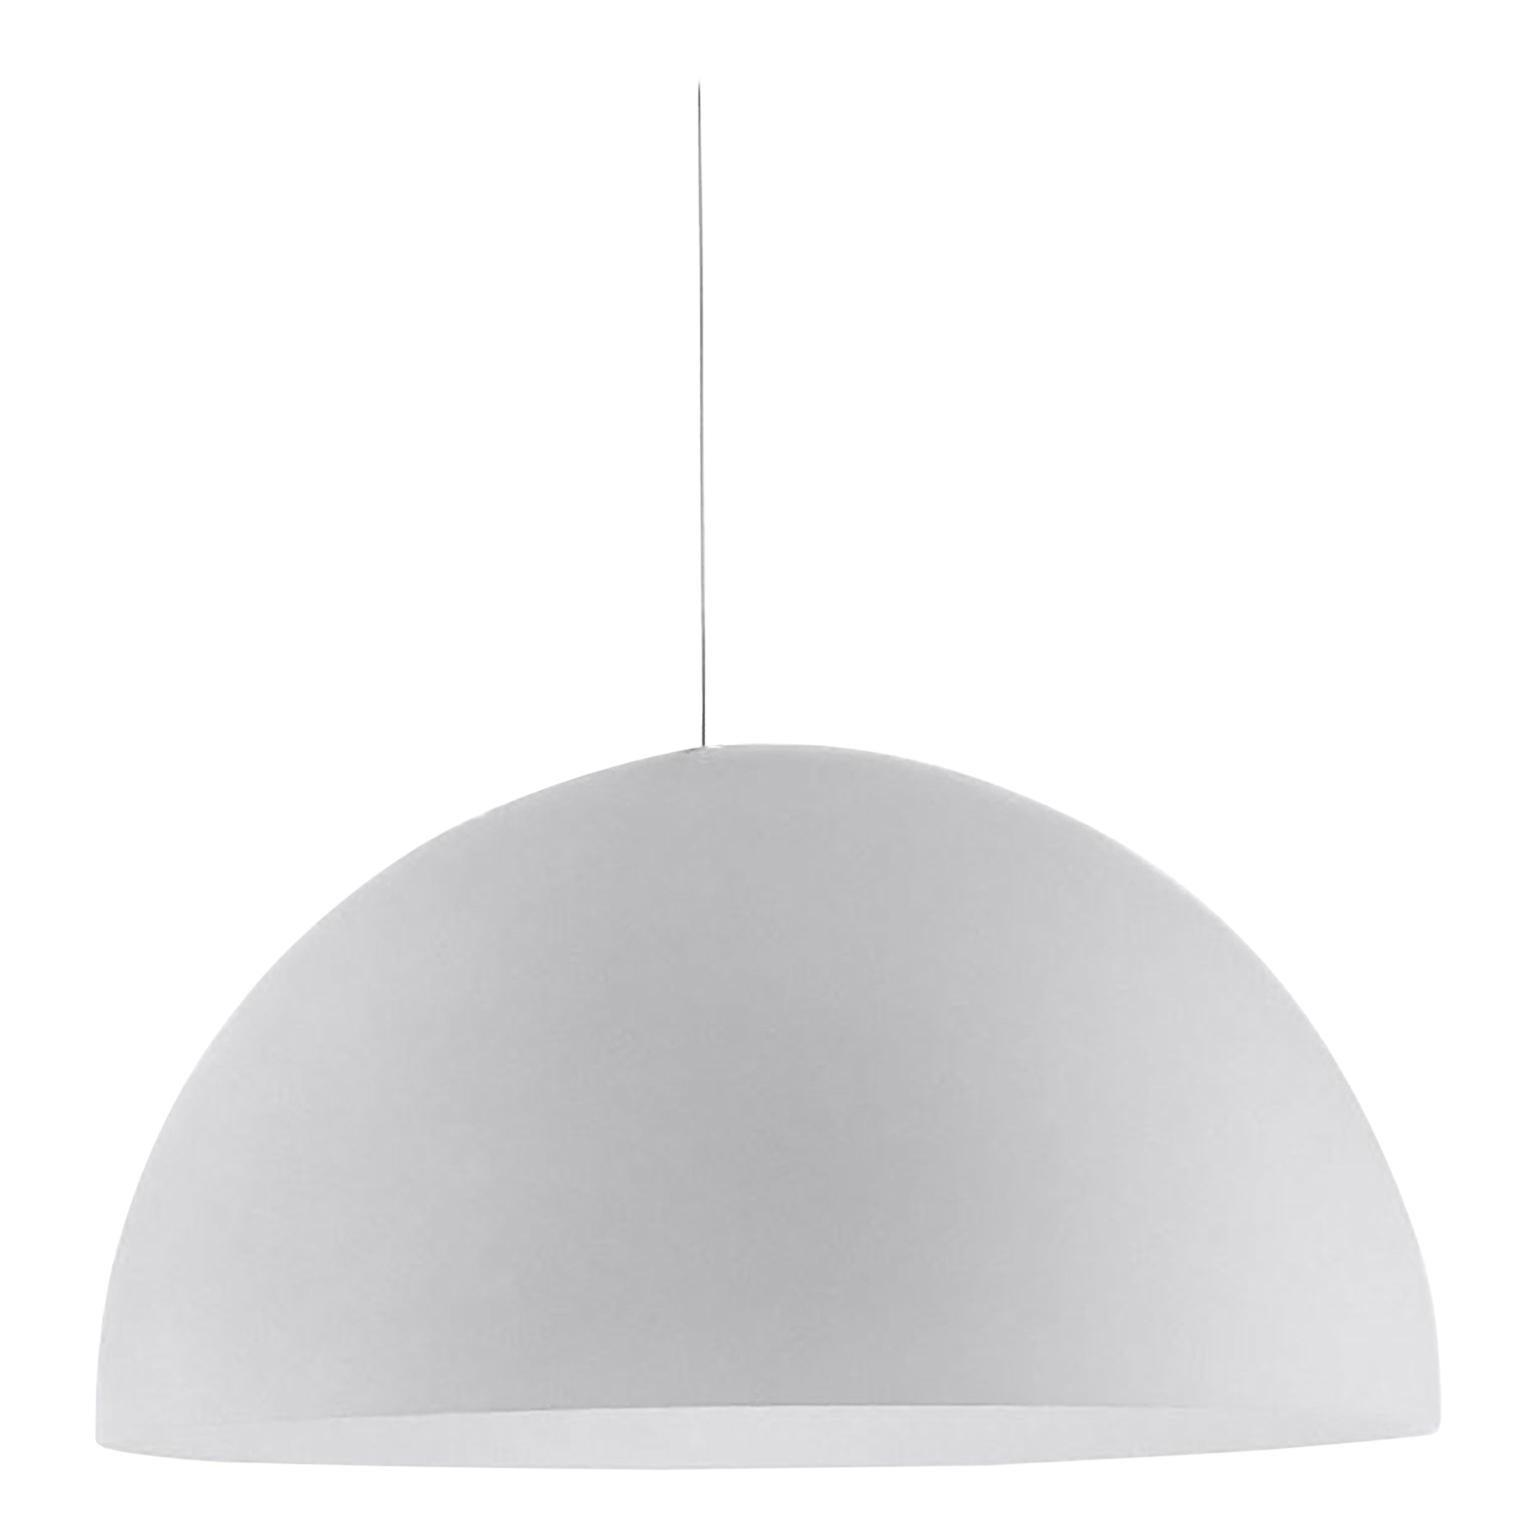 Sonora Suspension Lamp by Vico Magistretti for Oluce